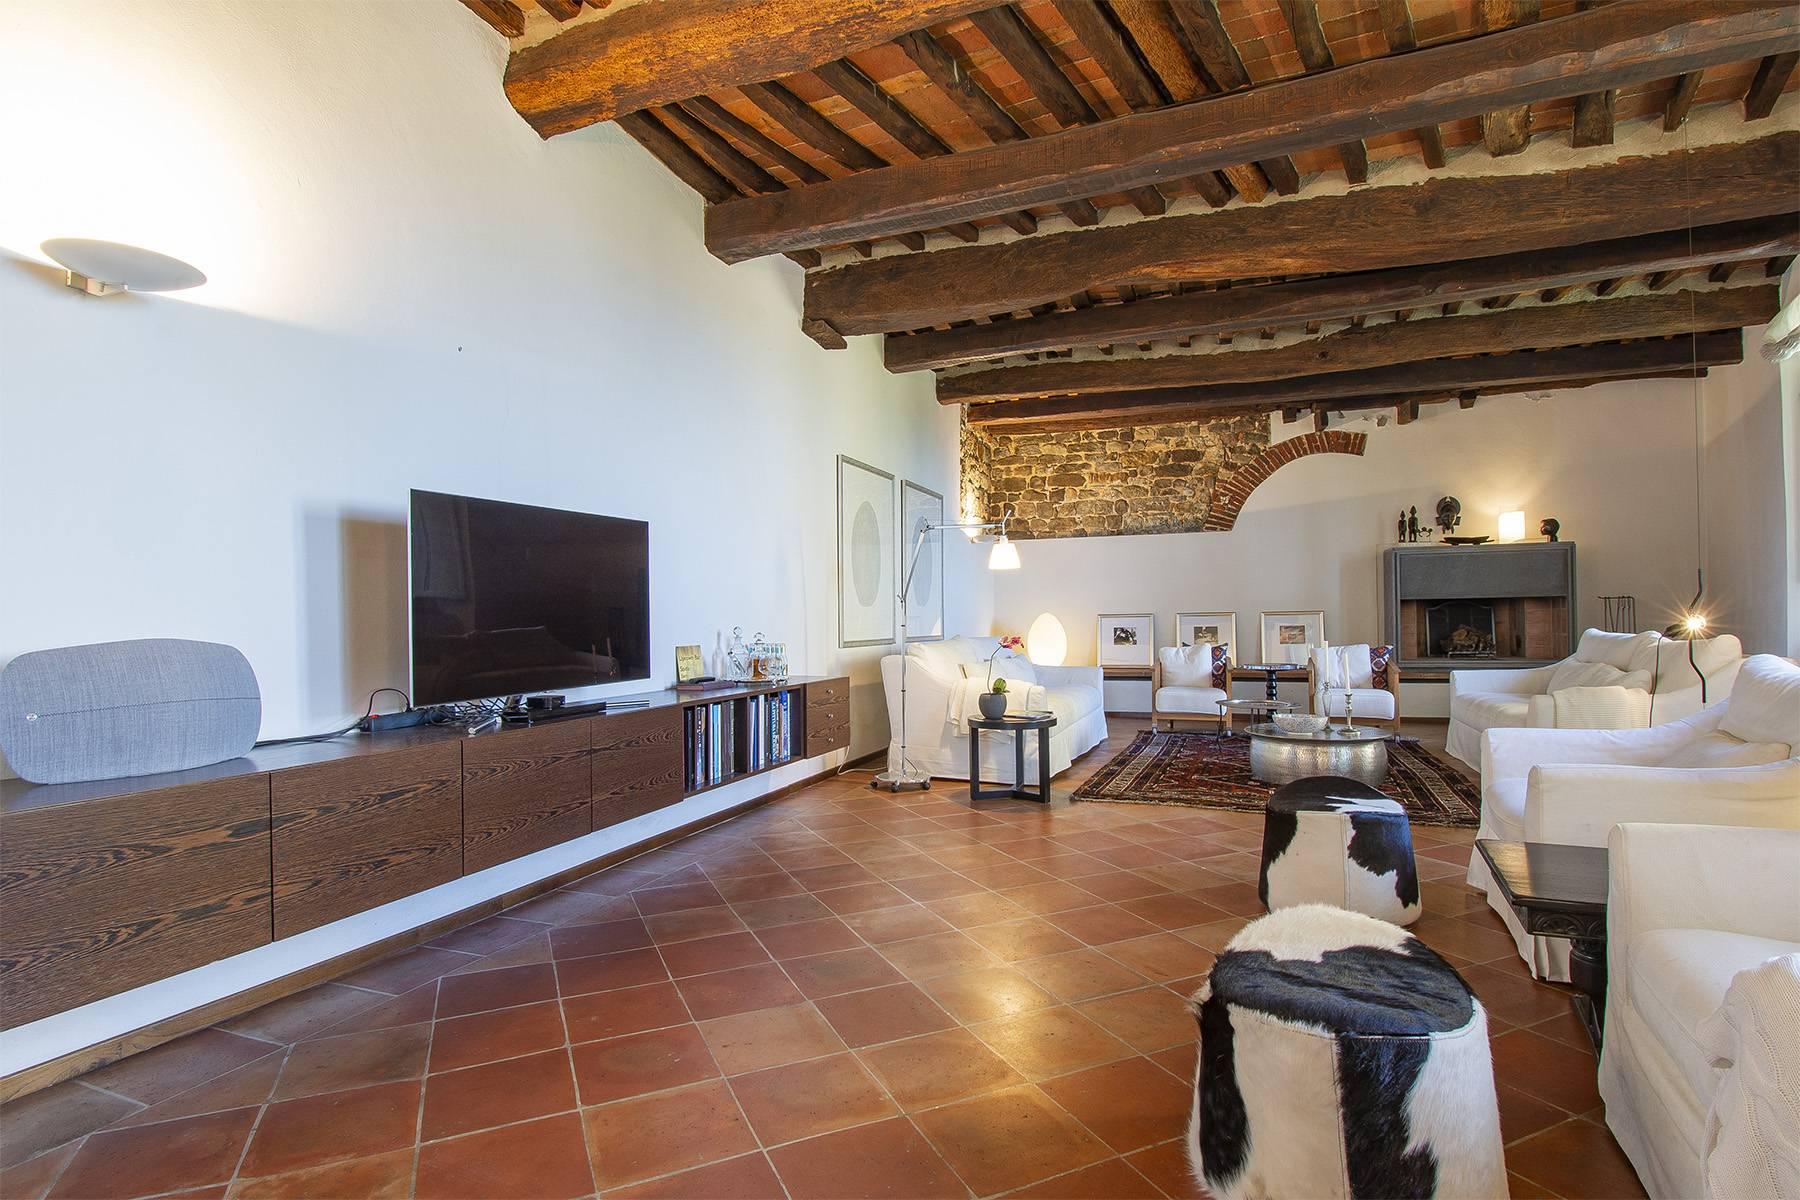 Villa in Vendita a Capannori: 5 locali, 380 mq - Foto 4